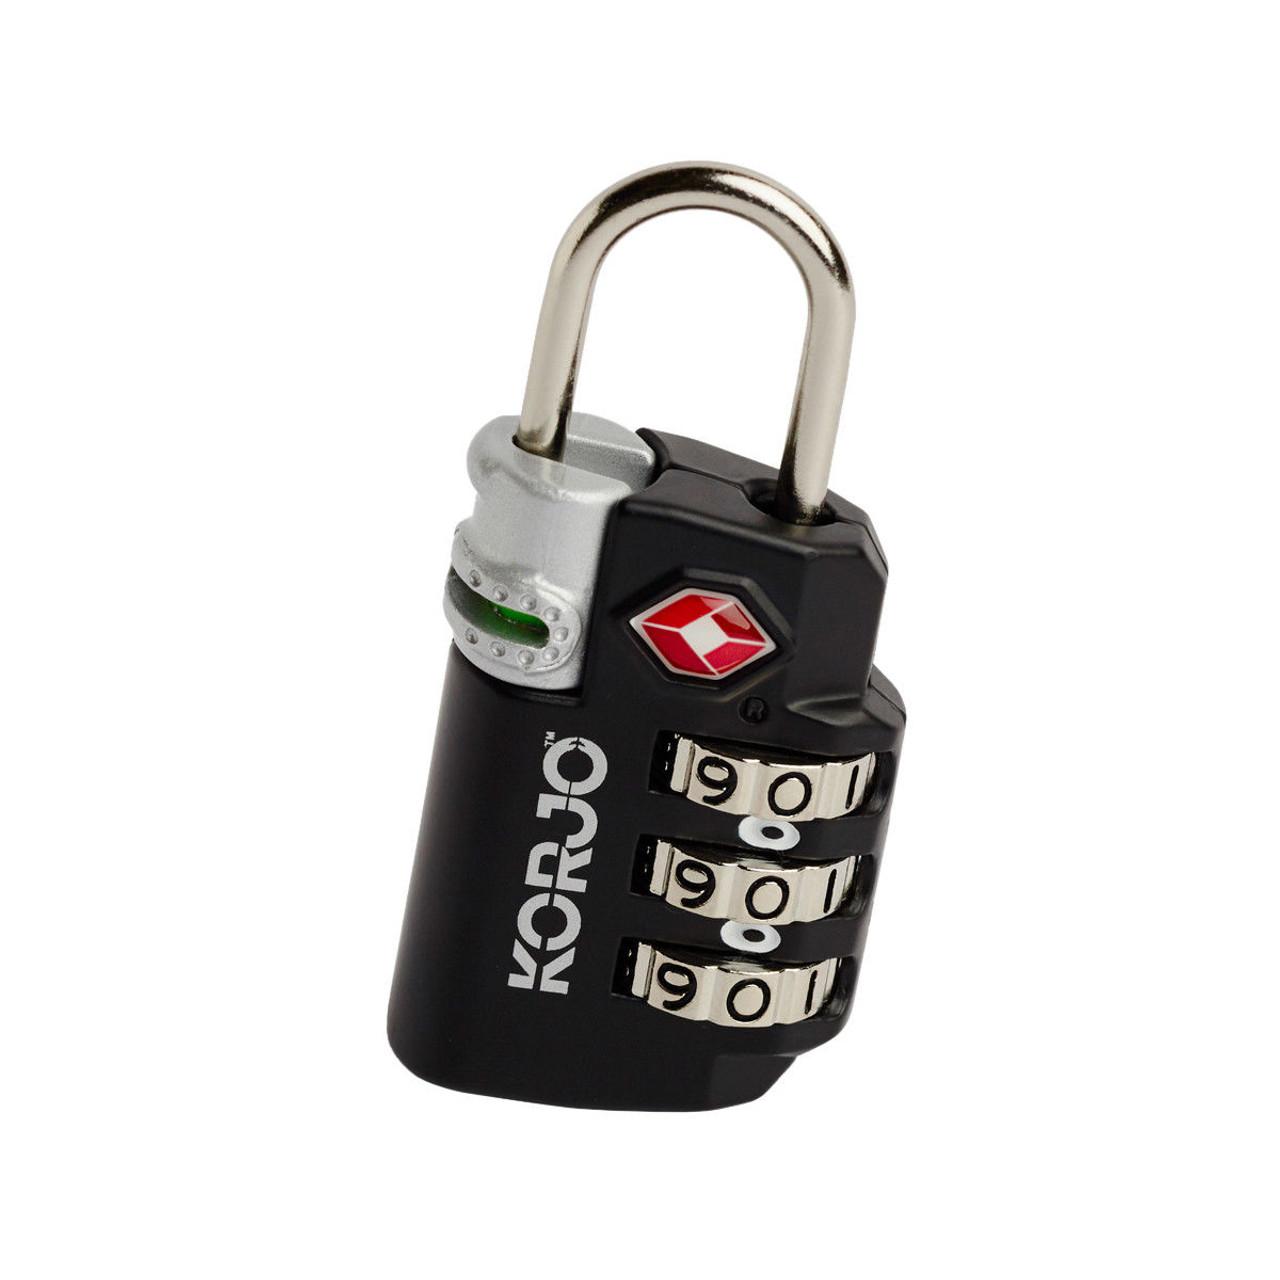 Korjo TSA72 TSA Indicator Combination Lock a Must-Have for Travelling to USA